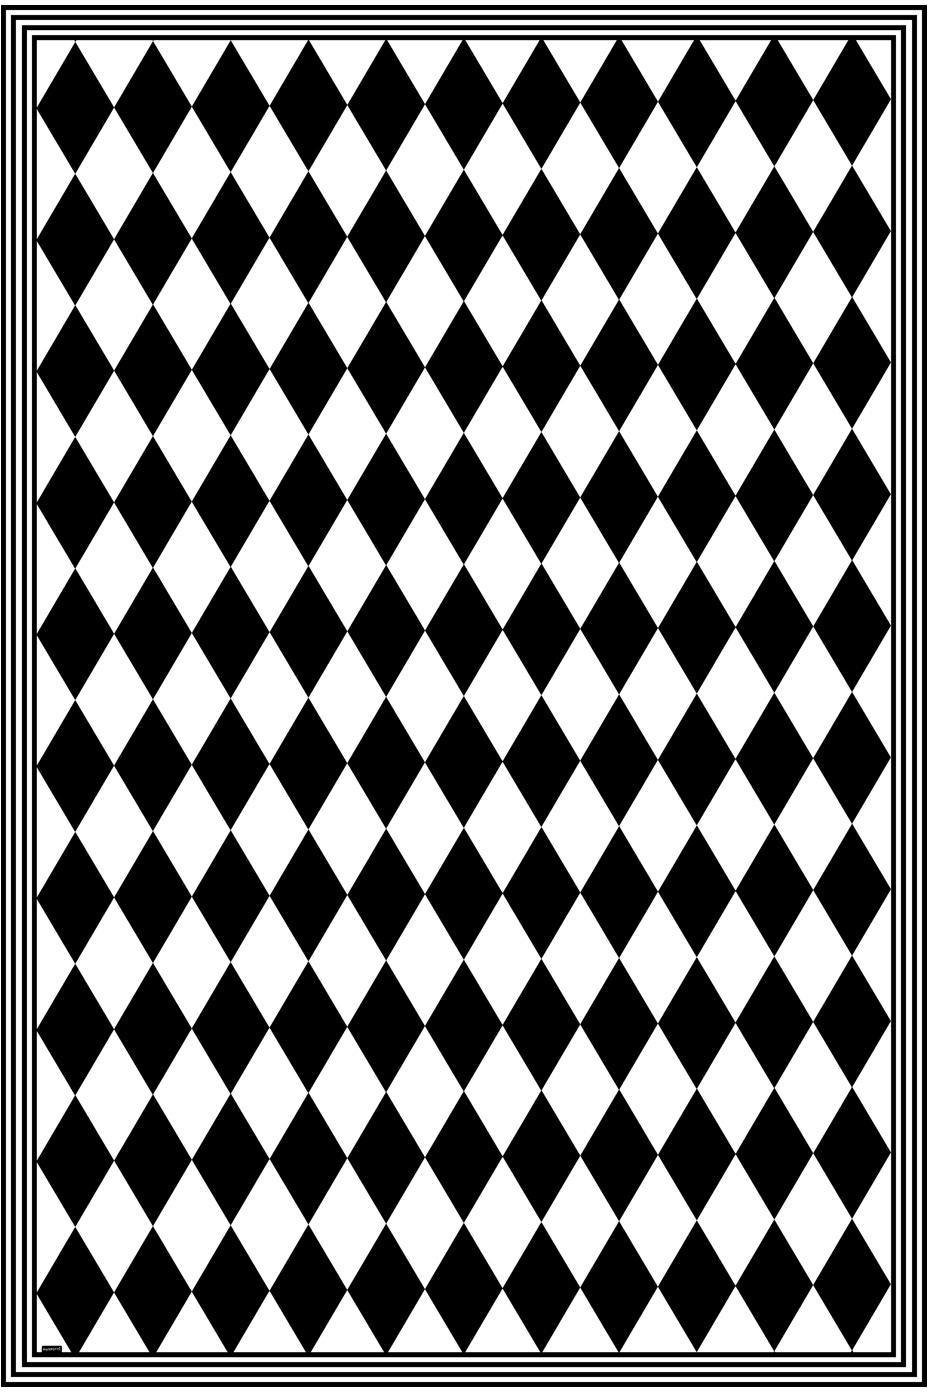 Vinyl-Bodenmatte Bobby II, Vinyl, recycelbar, Schwarz, Weiß, 135 x 200 cm